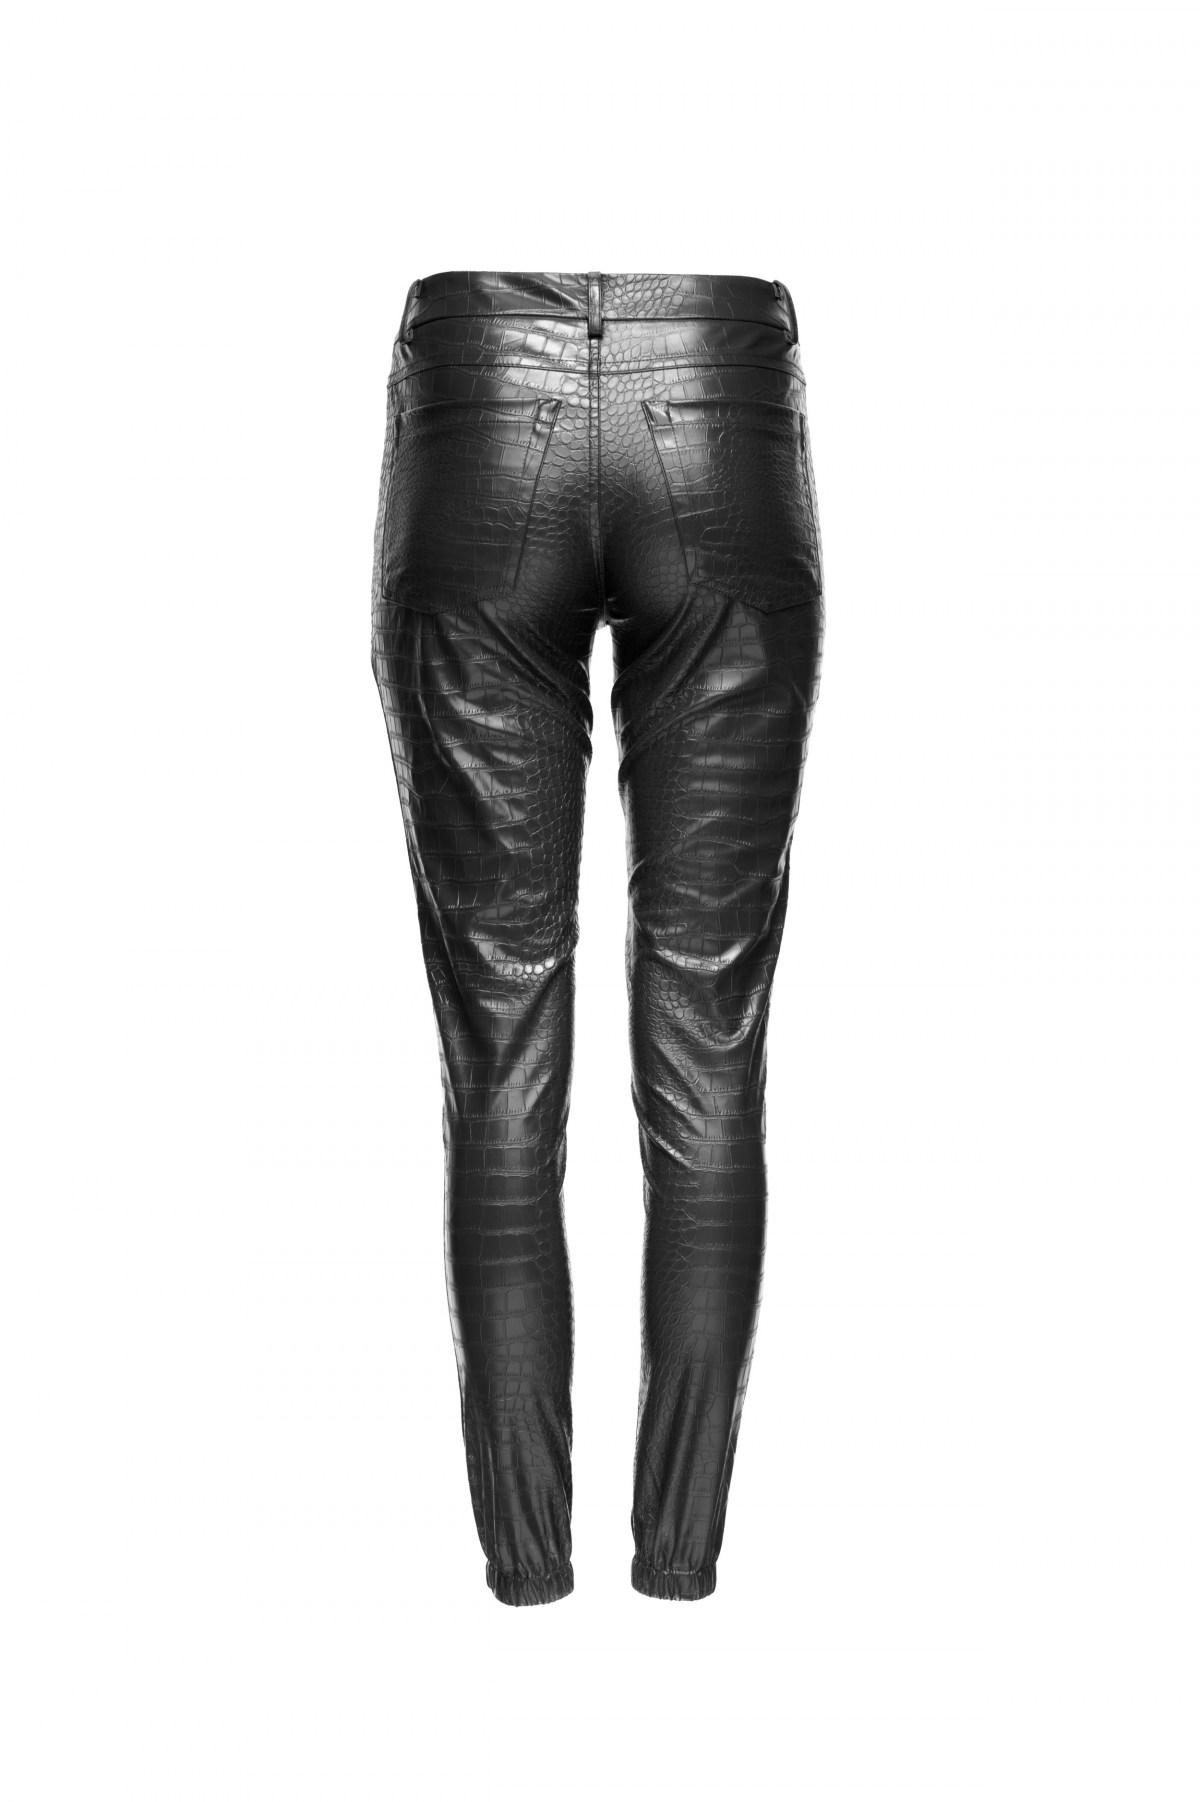 Corc Leather Pants by Jennifer Le, available on iamjenniferle.com for $129 Kylie Jenner Pants Exact Product